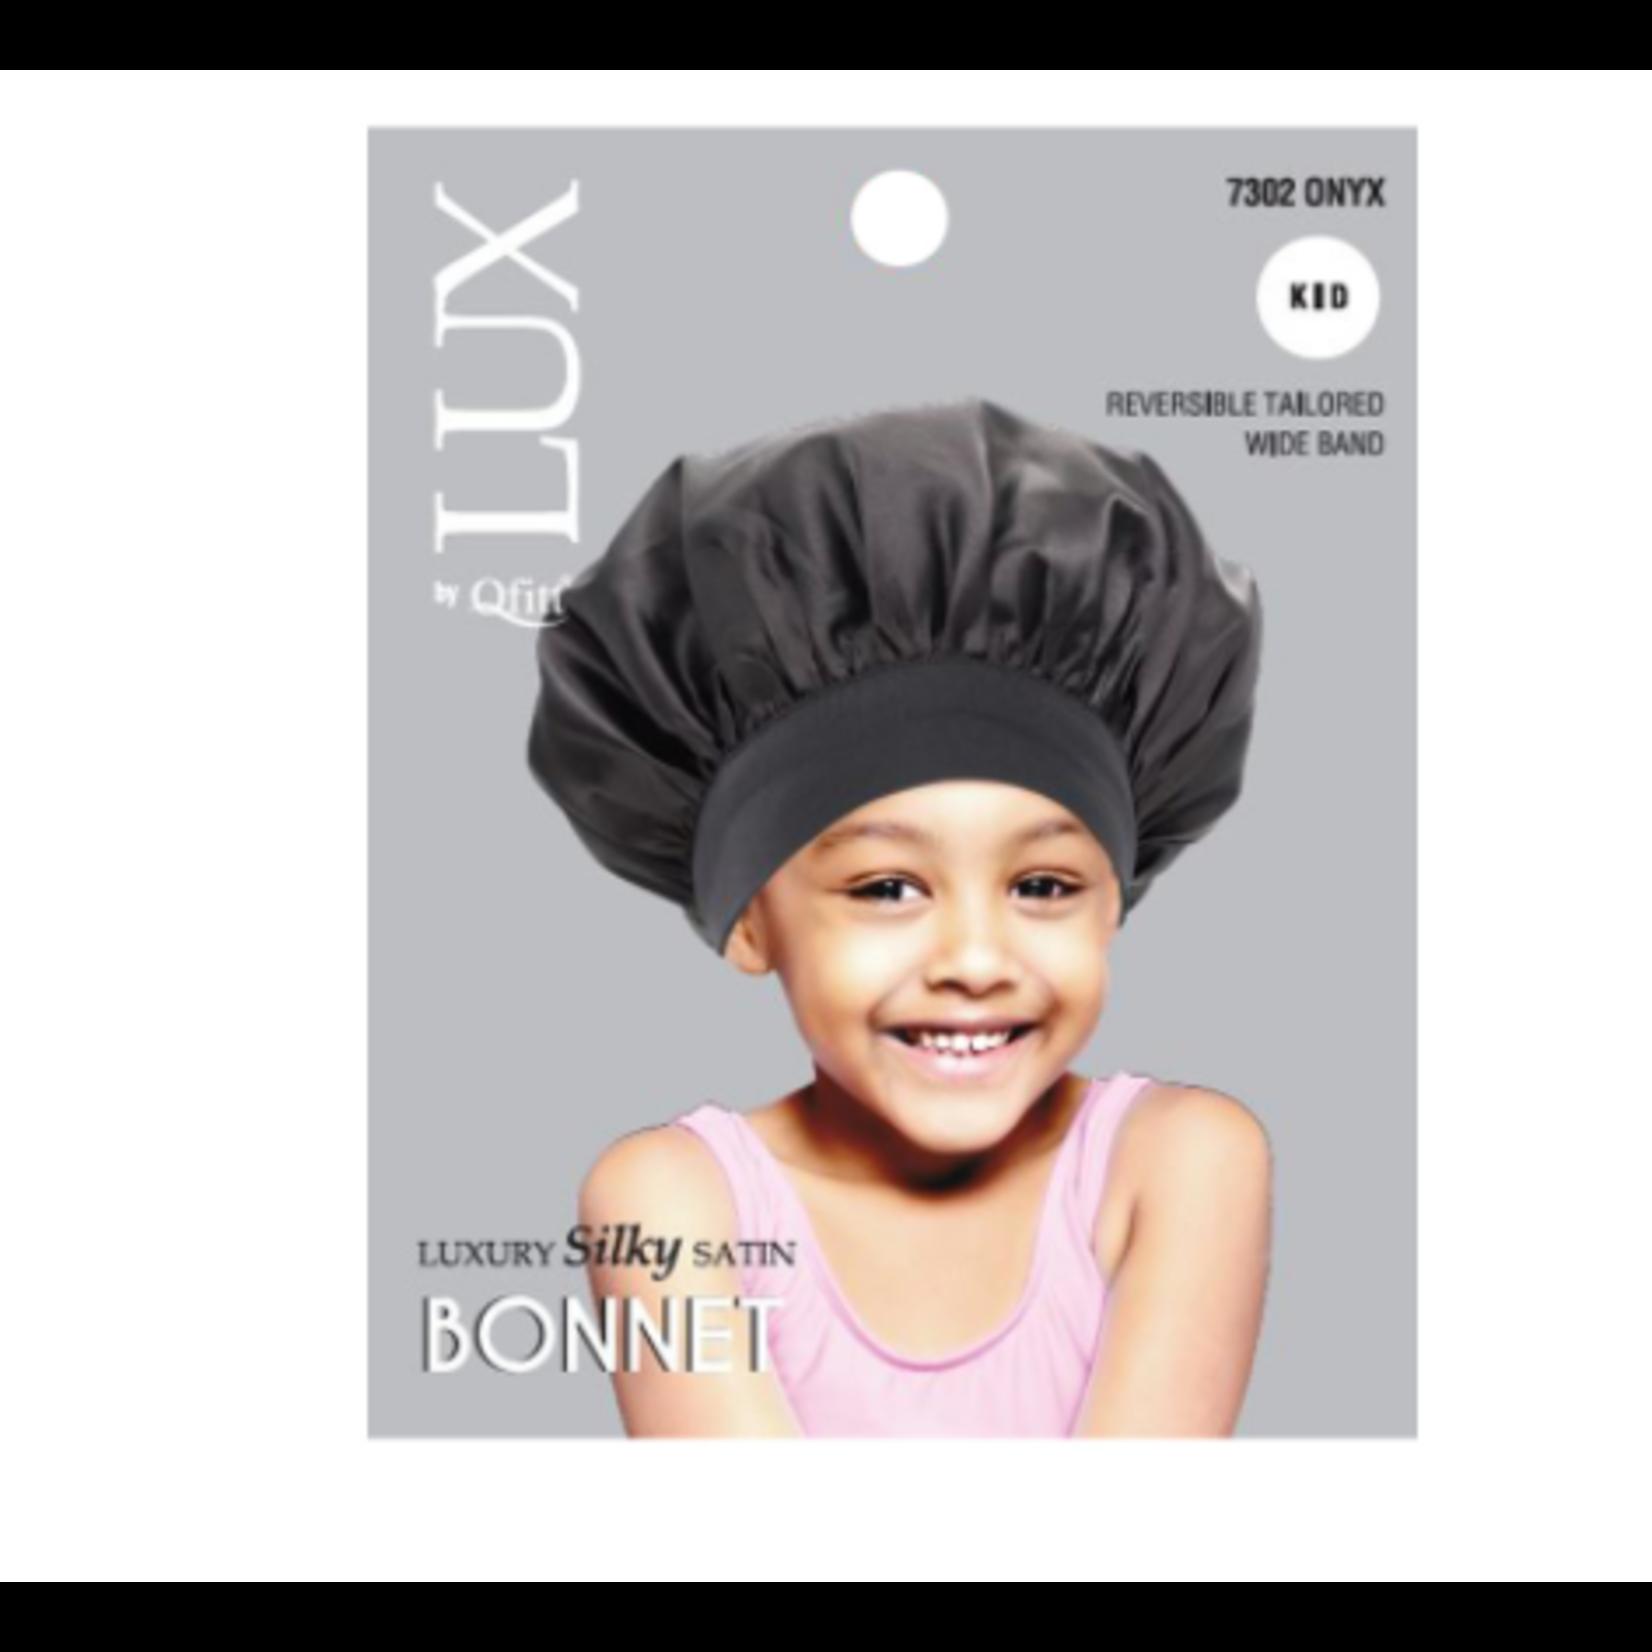 Lux by Qfitt M&M Kid Silk Bonnet